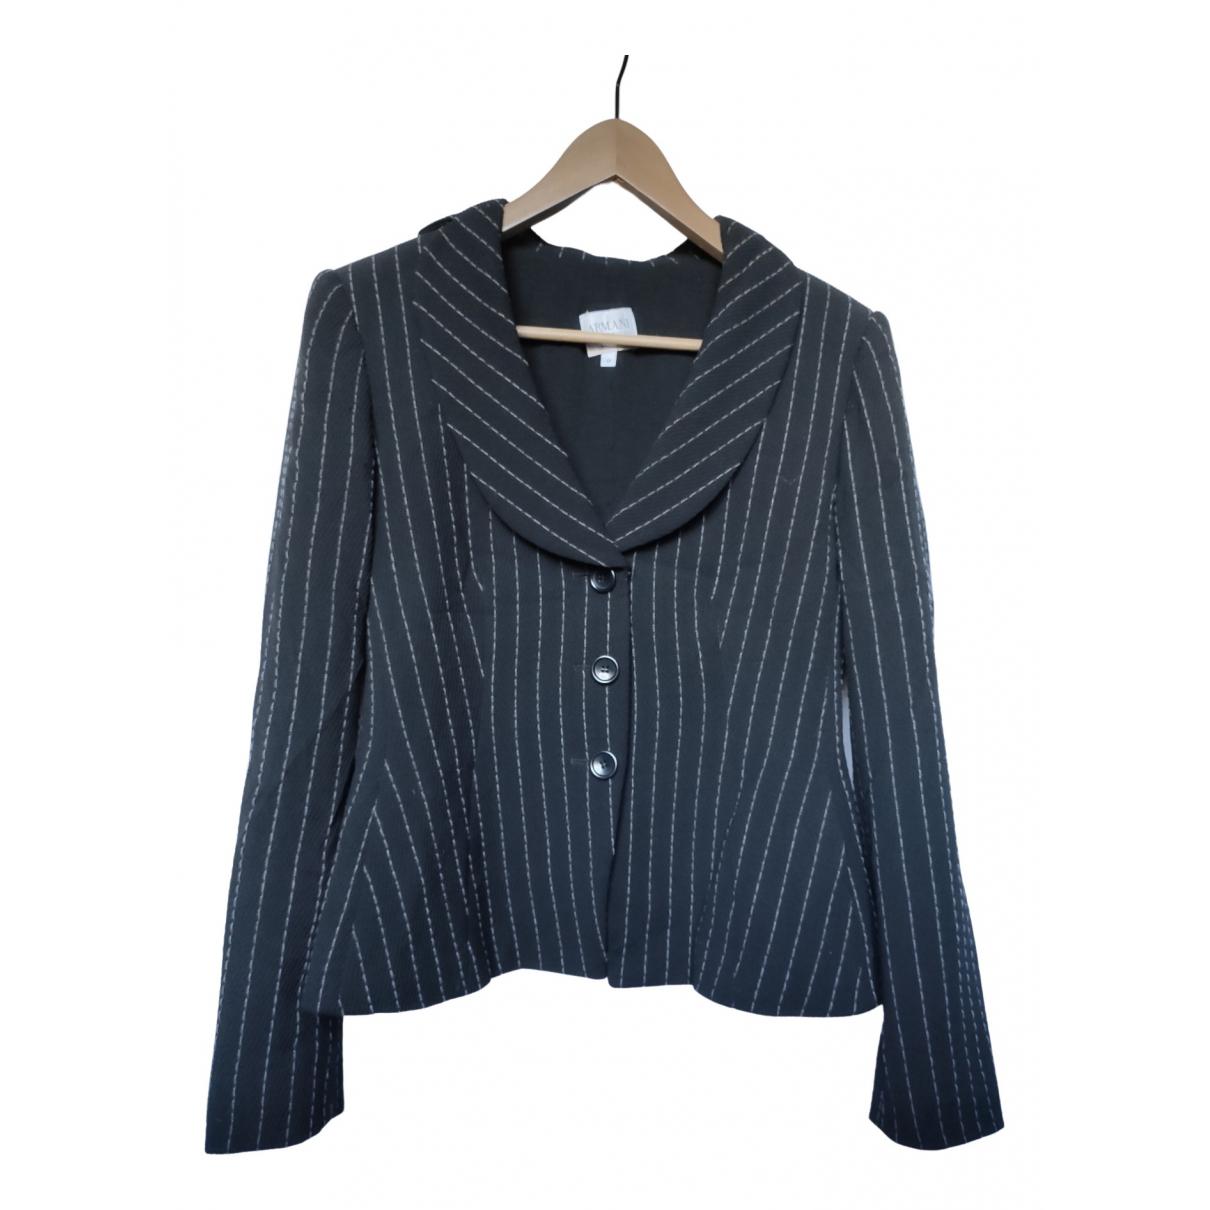 Armani Collezioni \N Black Wool jacket for Women 44 IT